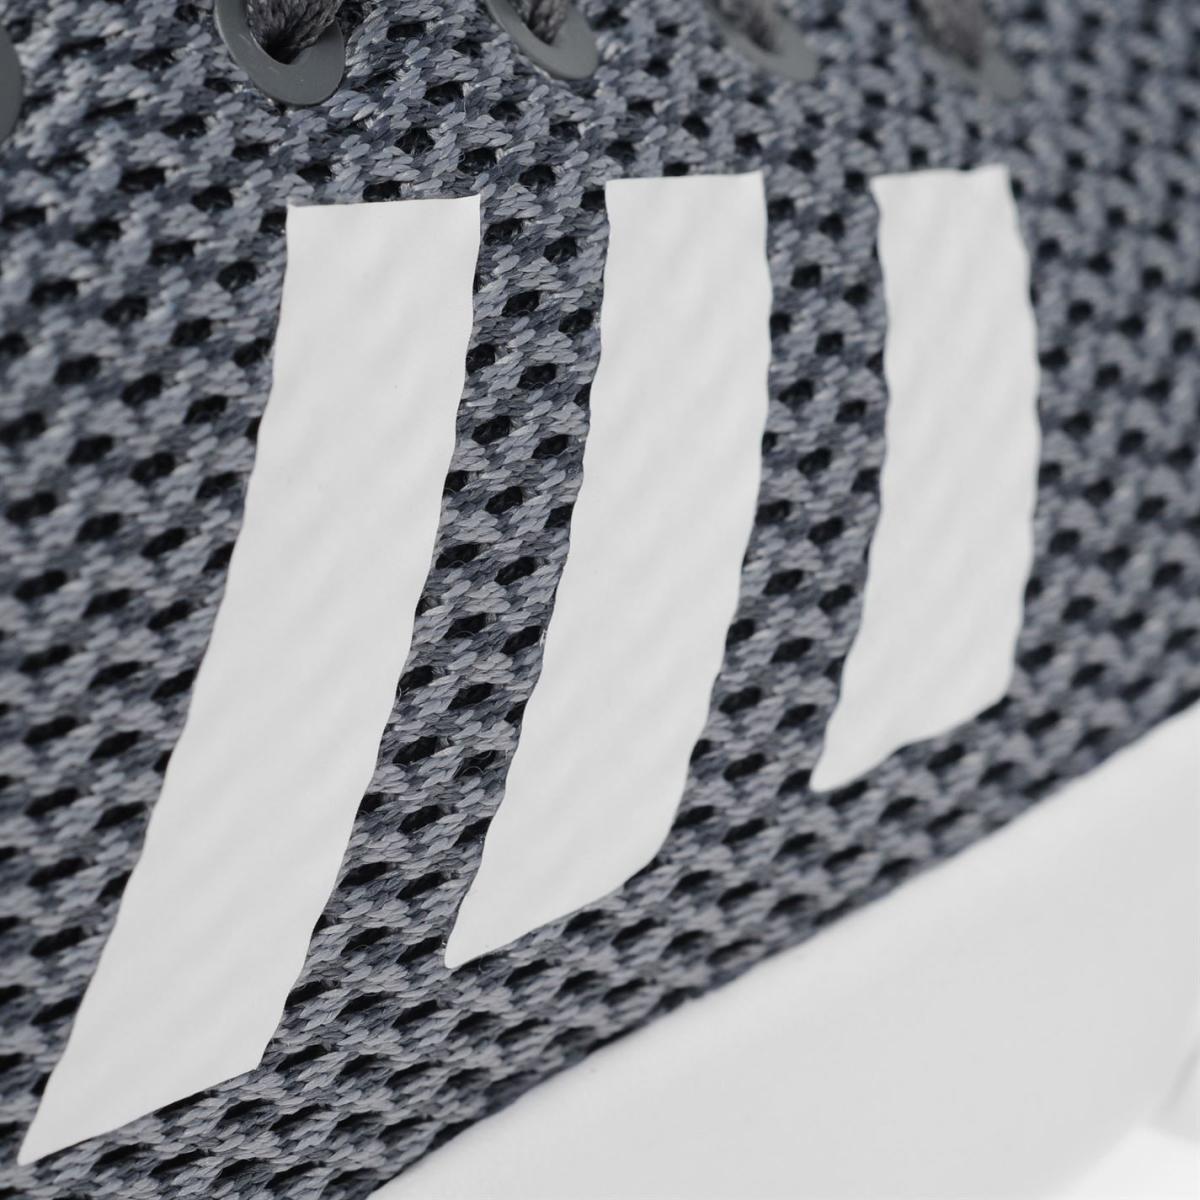 adidas Cloudfoam Racer Herren Turnschuhe Sportschuhe Gry_Wht_Blau